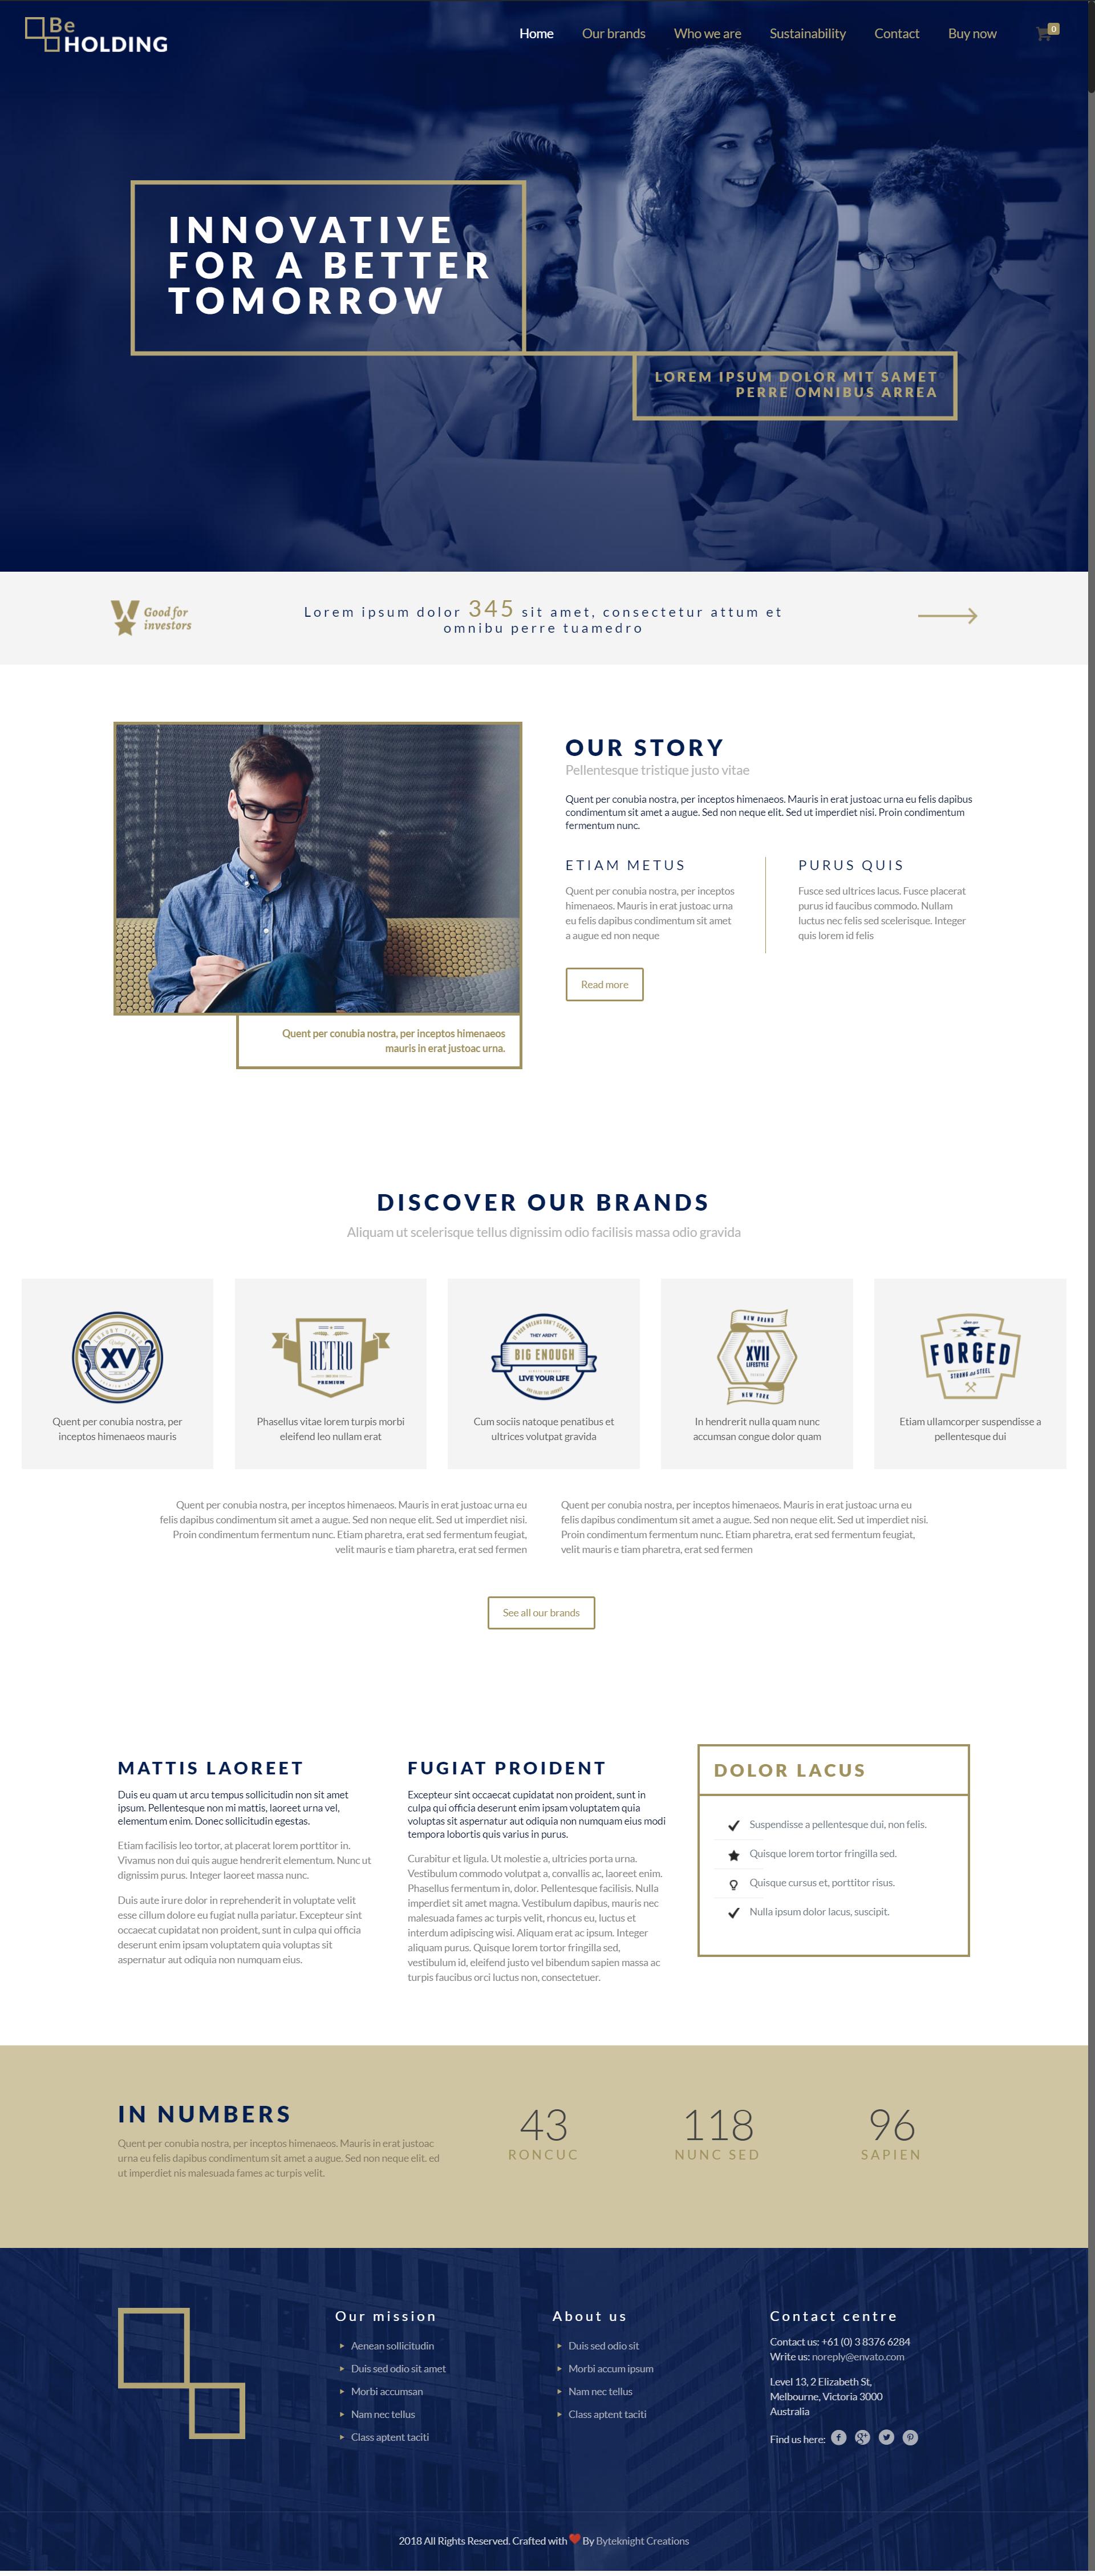 Best Web Designs Templates Themes Holding Company Website Design Demo Byteknightdesigns Bk Corporate Web Design Corporate Website Design News Web Design